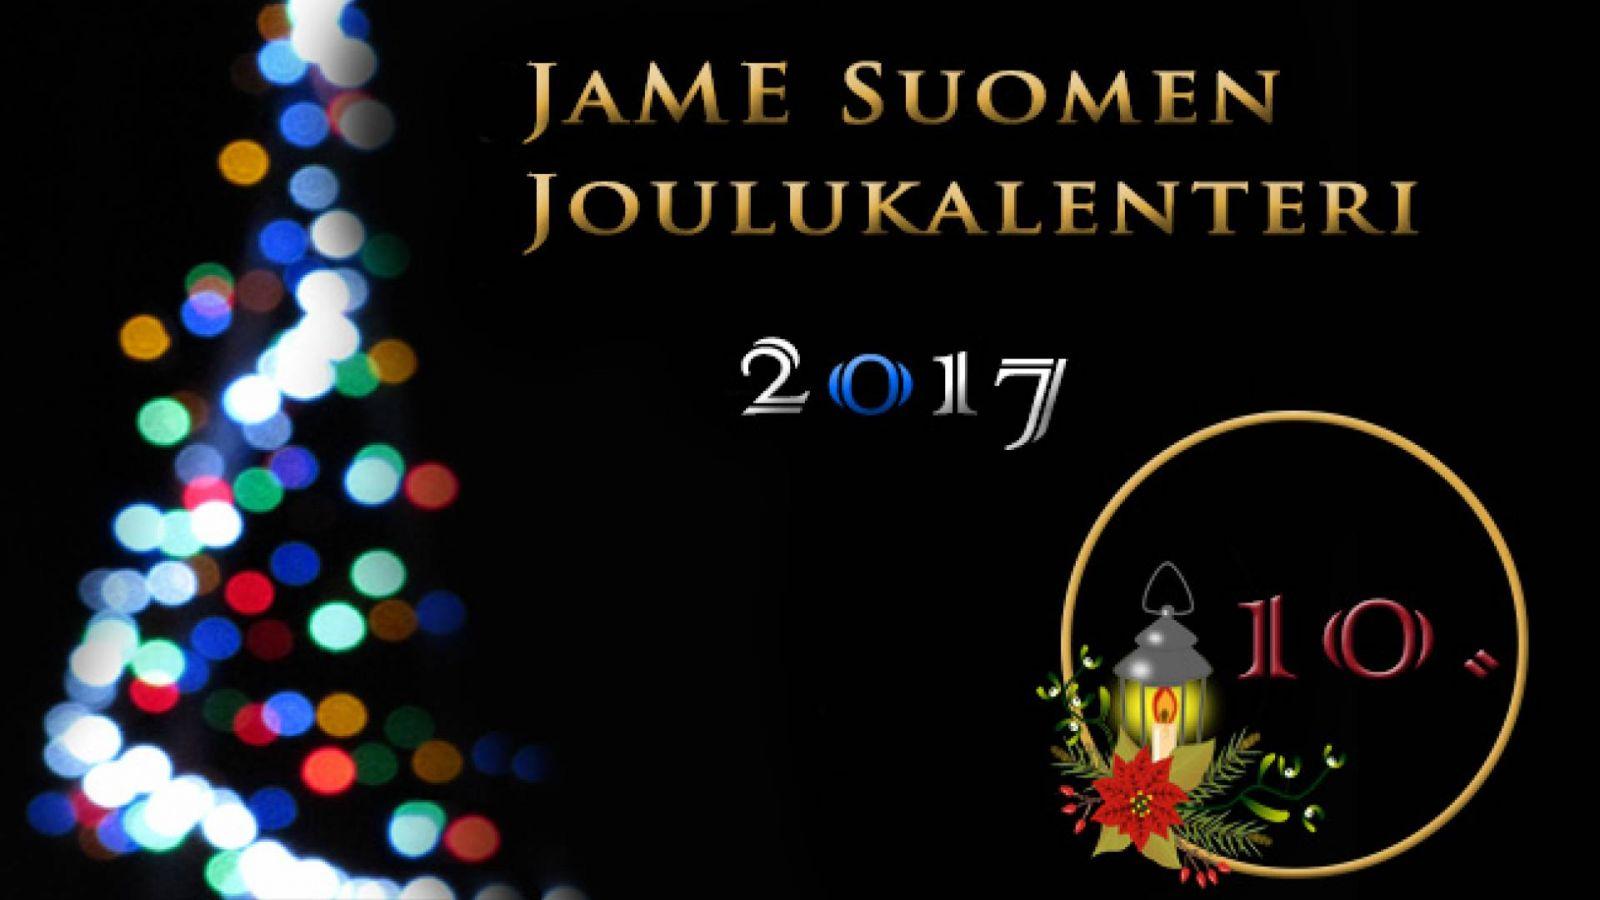 JaME Suomen joulukalenterin 10. luukku © Nipsu